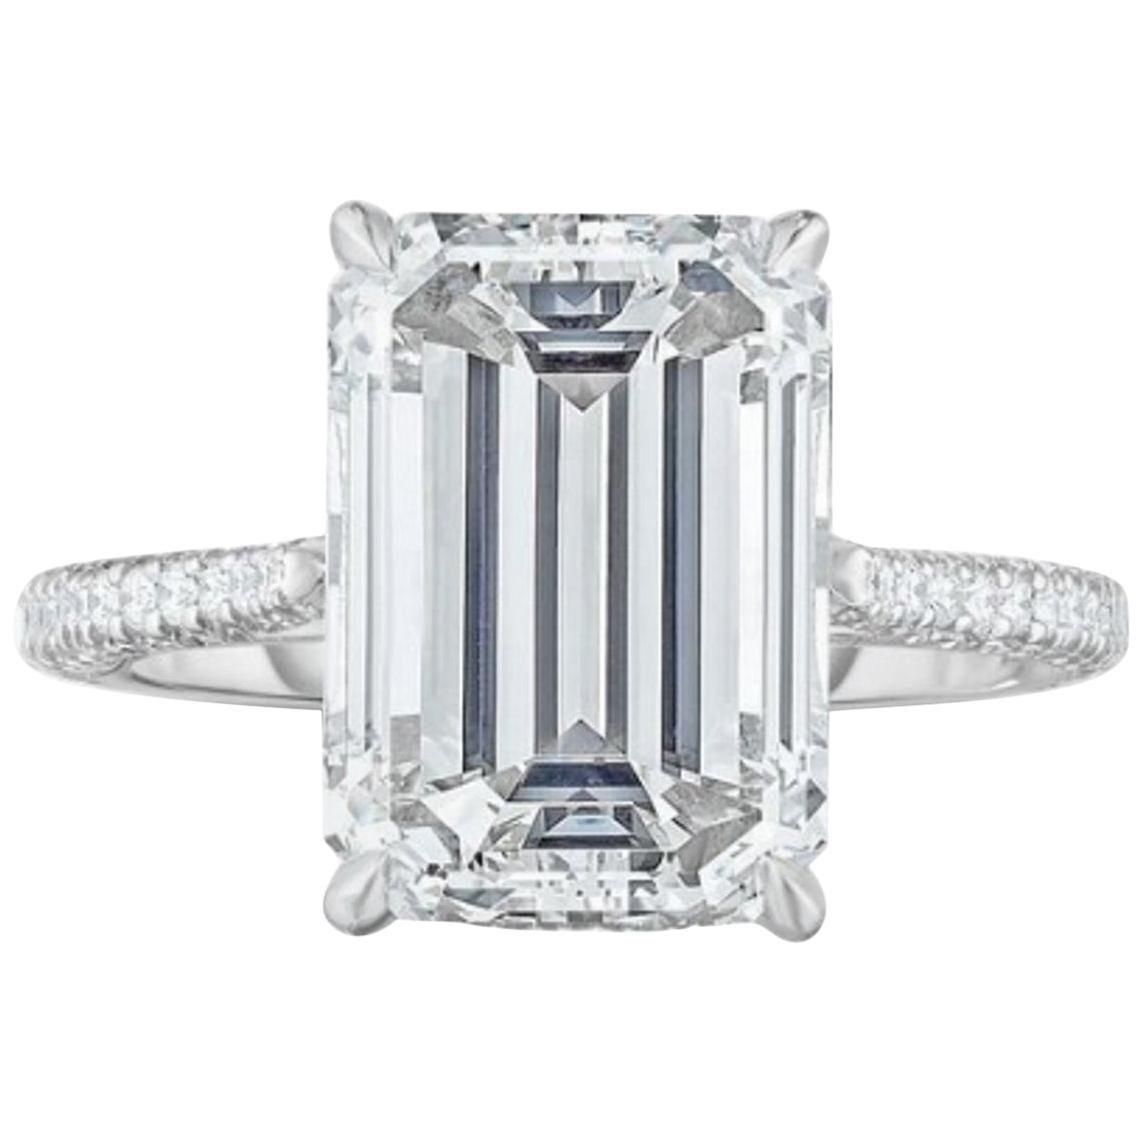 GIA Certified 1.75 Carat Diamond Long Emerald Cut Natural Diamond Ring